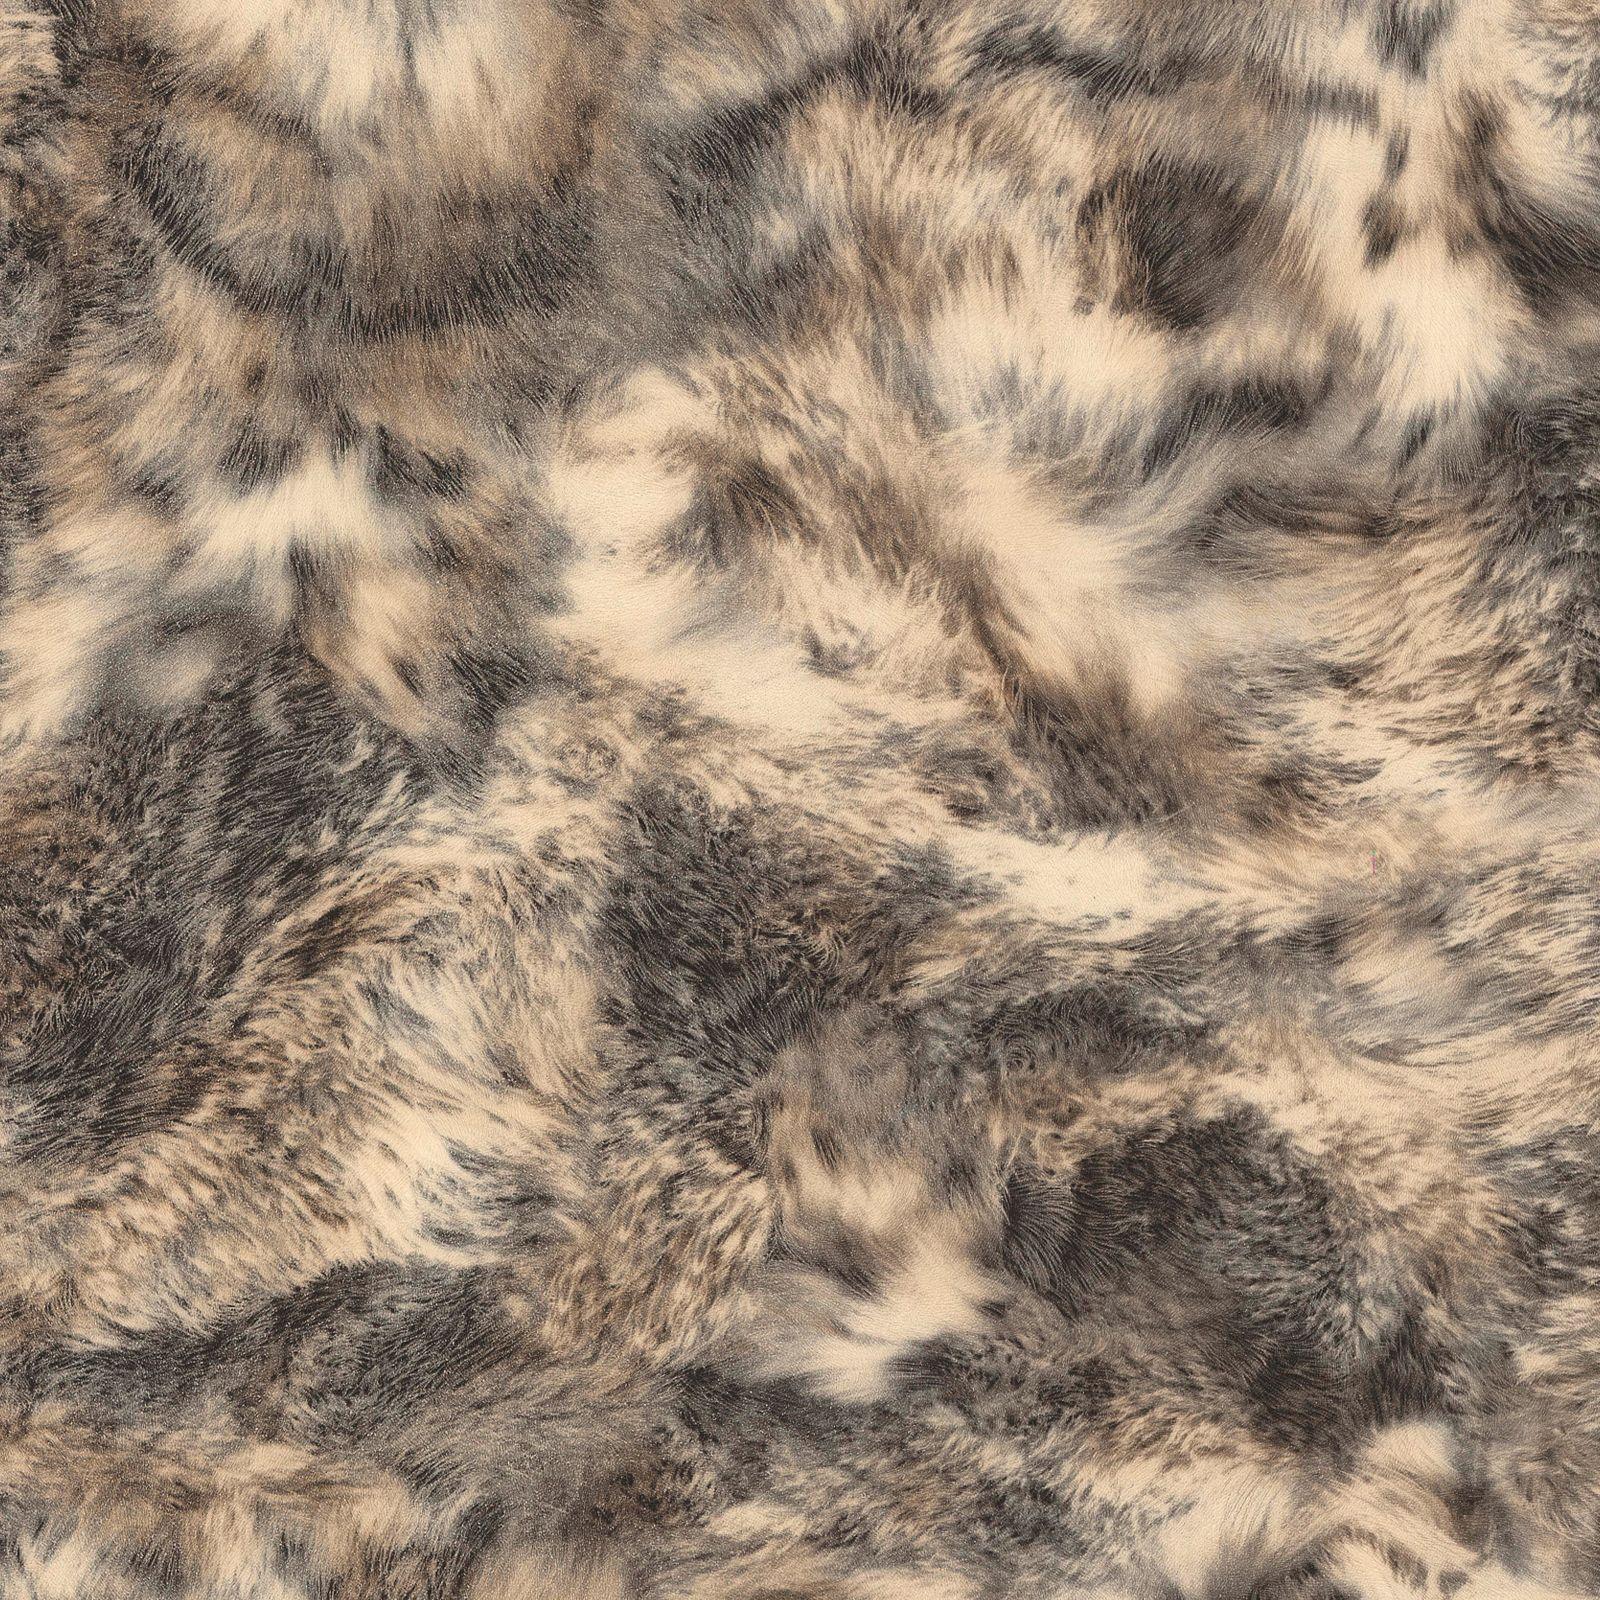 A S Creation Dekora Natural Beige Black Amp White Fur